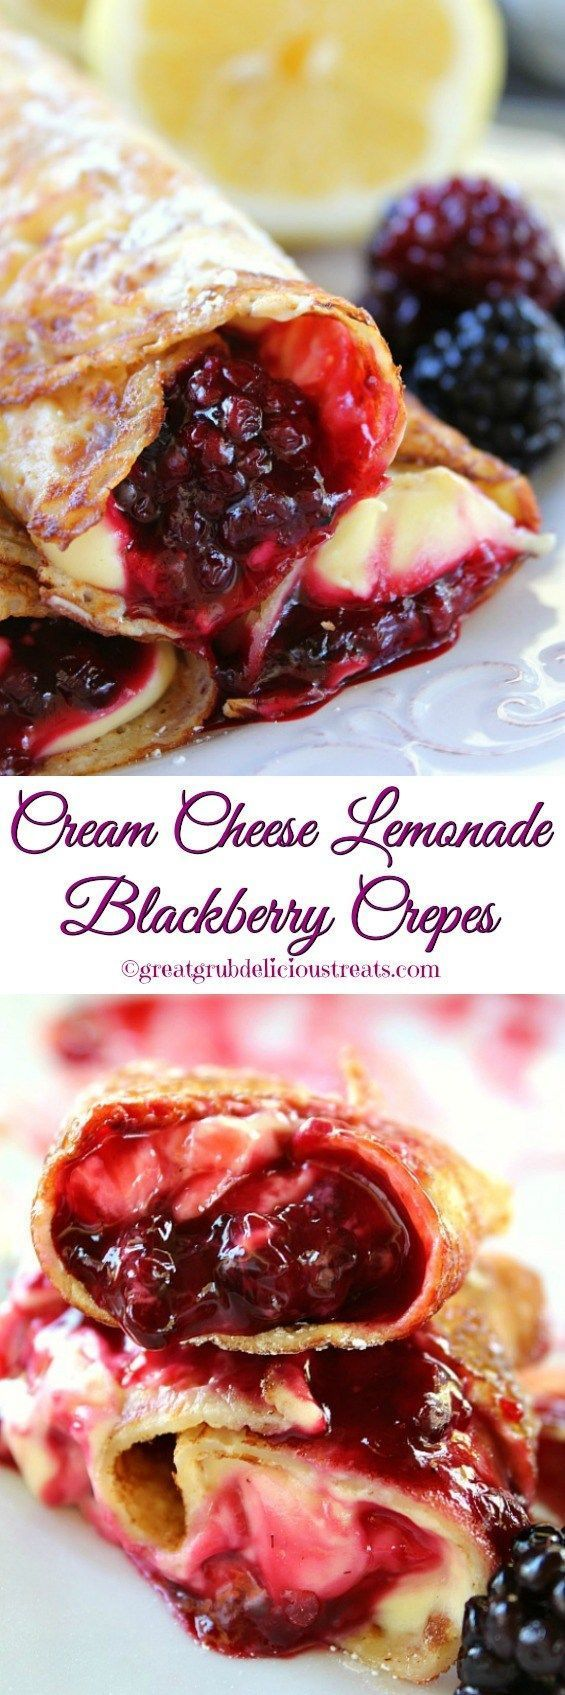 Cream Cheese Lemonade Blackberry Crepes #buttermilkpancakesrecipedinners